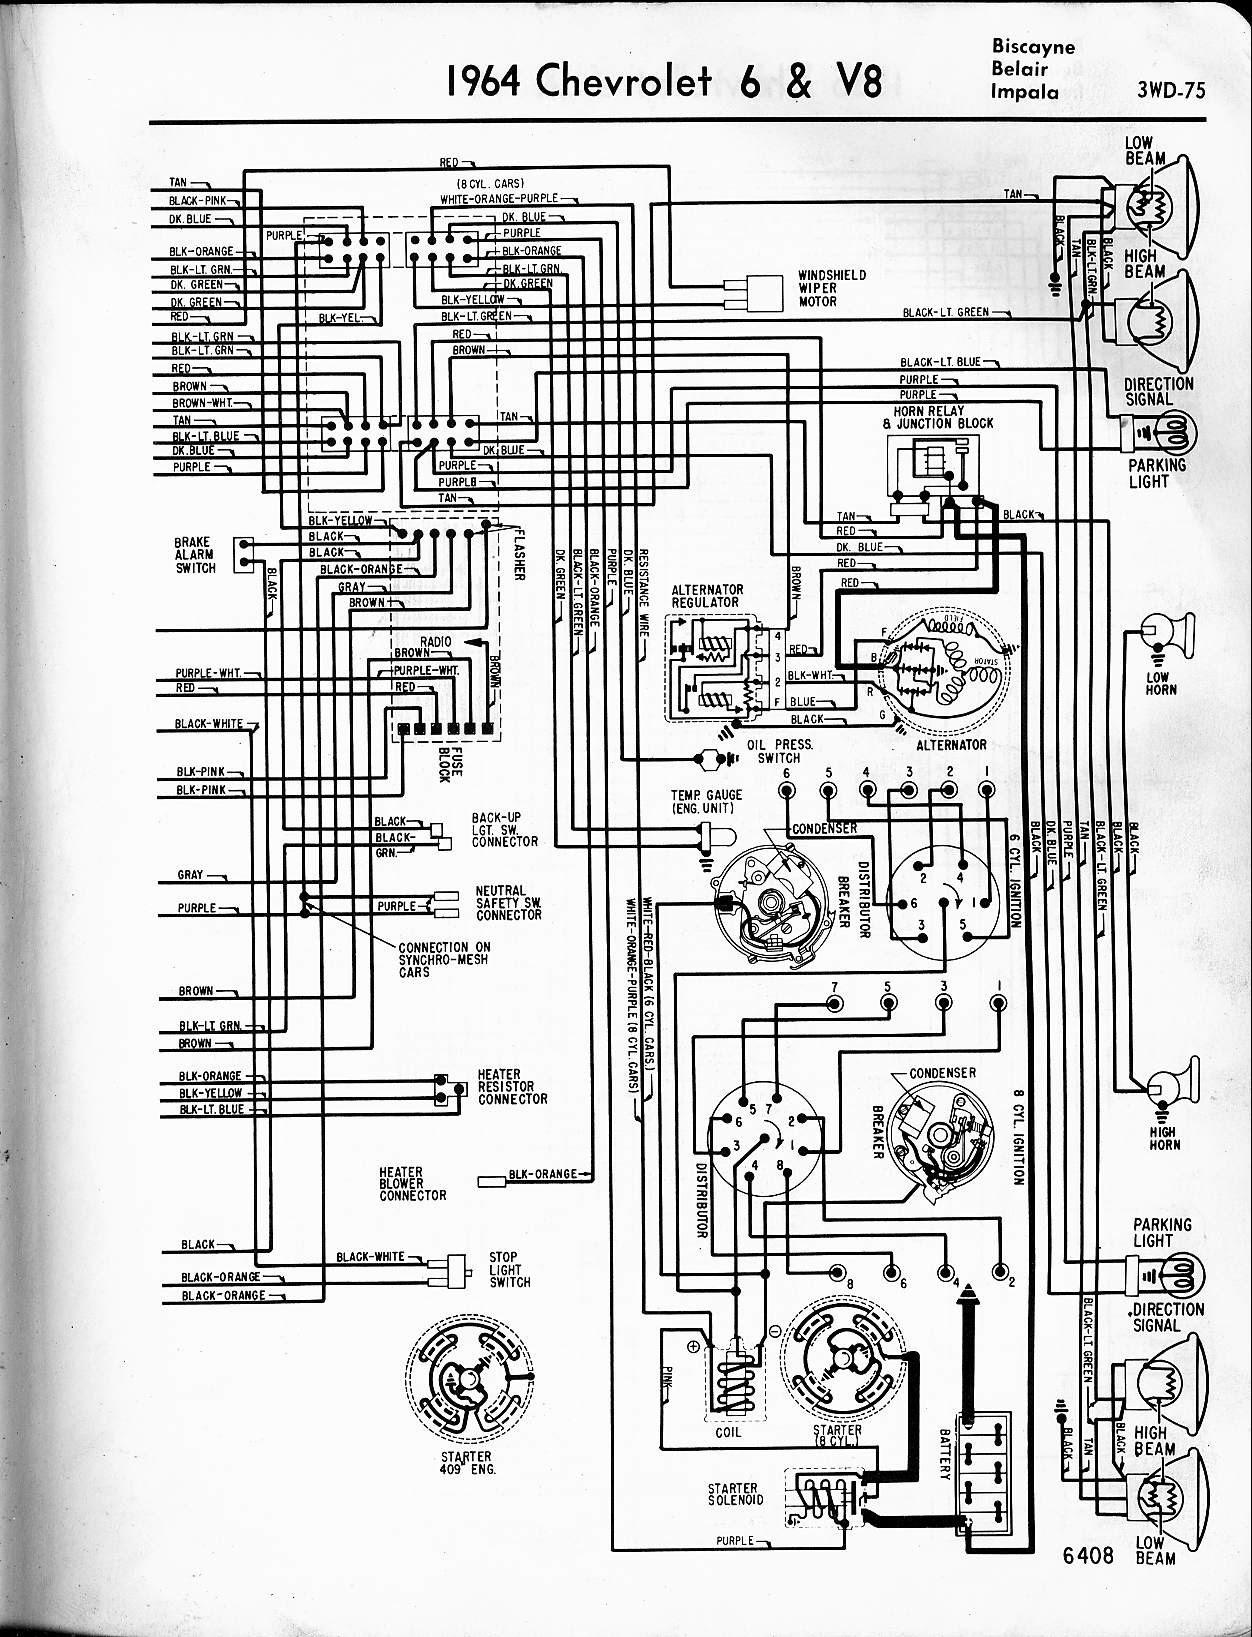 2006 Chevy Impala Headlight Wiring Diagram Home Theater Wiring Power Schematic Code 03 Honda Accordd Waystar Fr